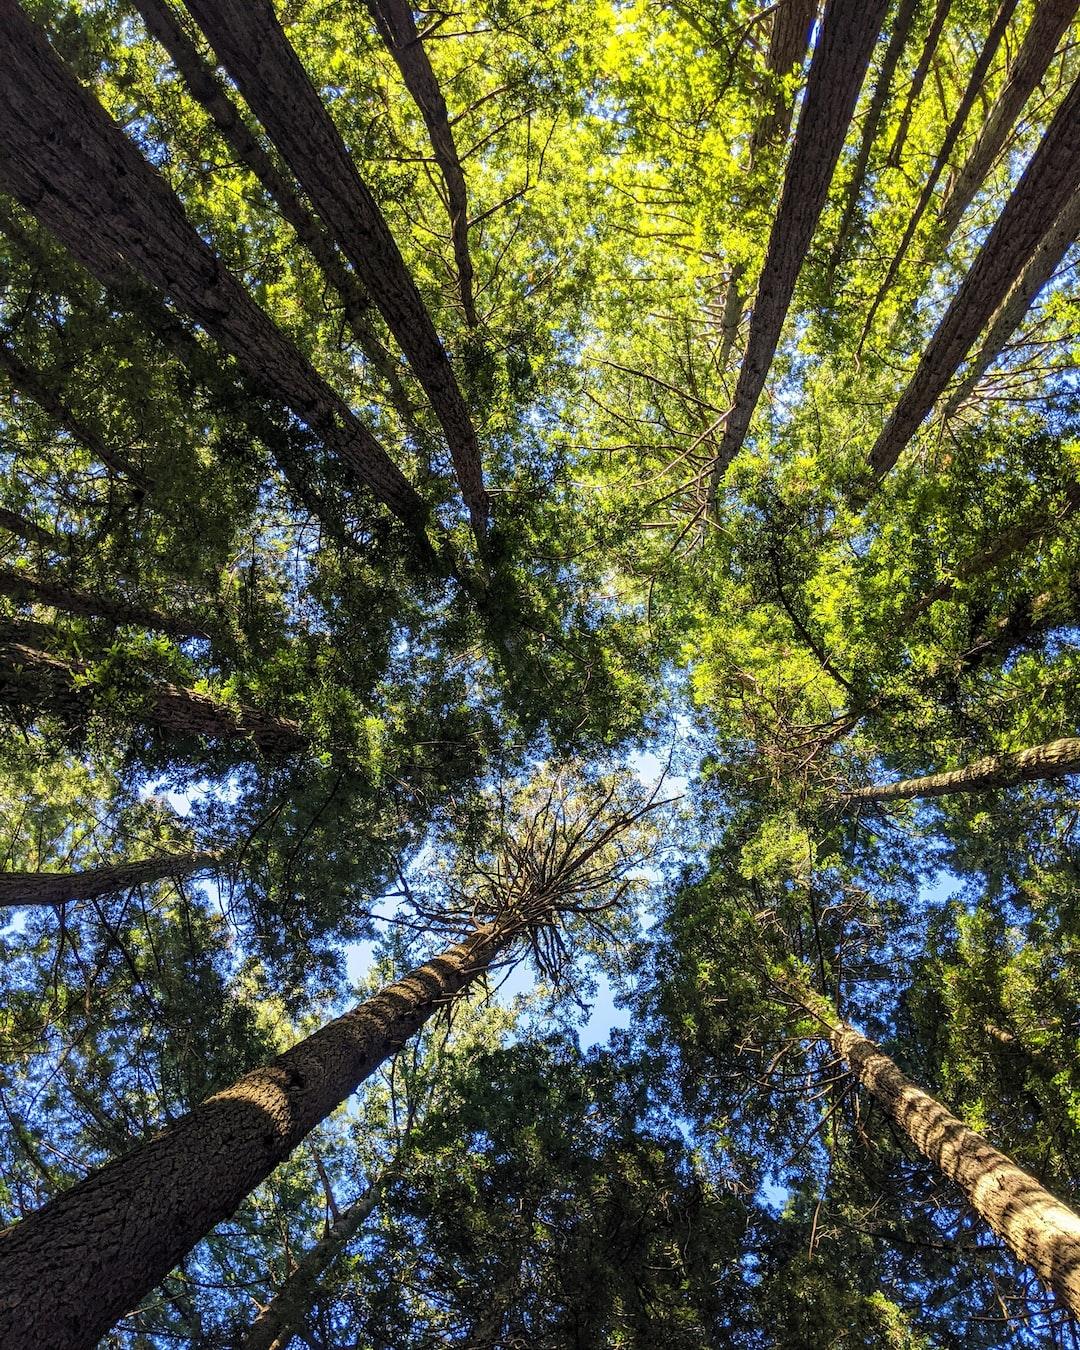 Trees shot from below near Muir Woods in California